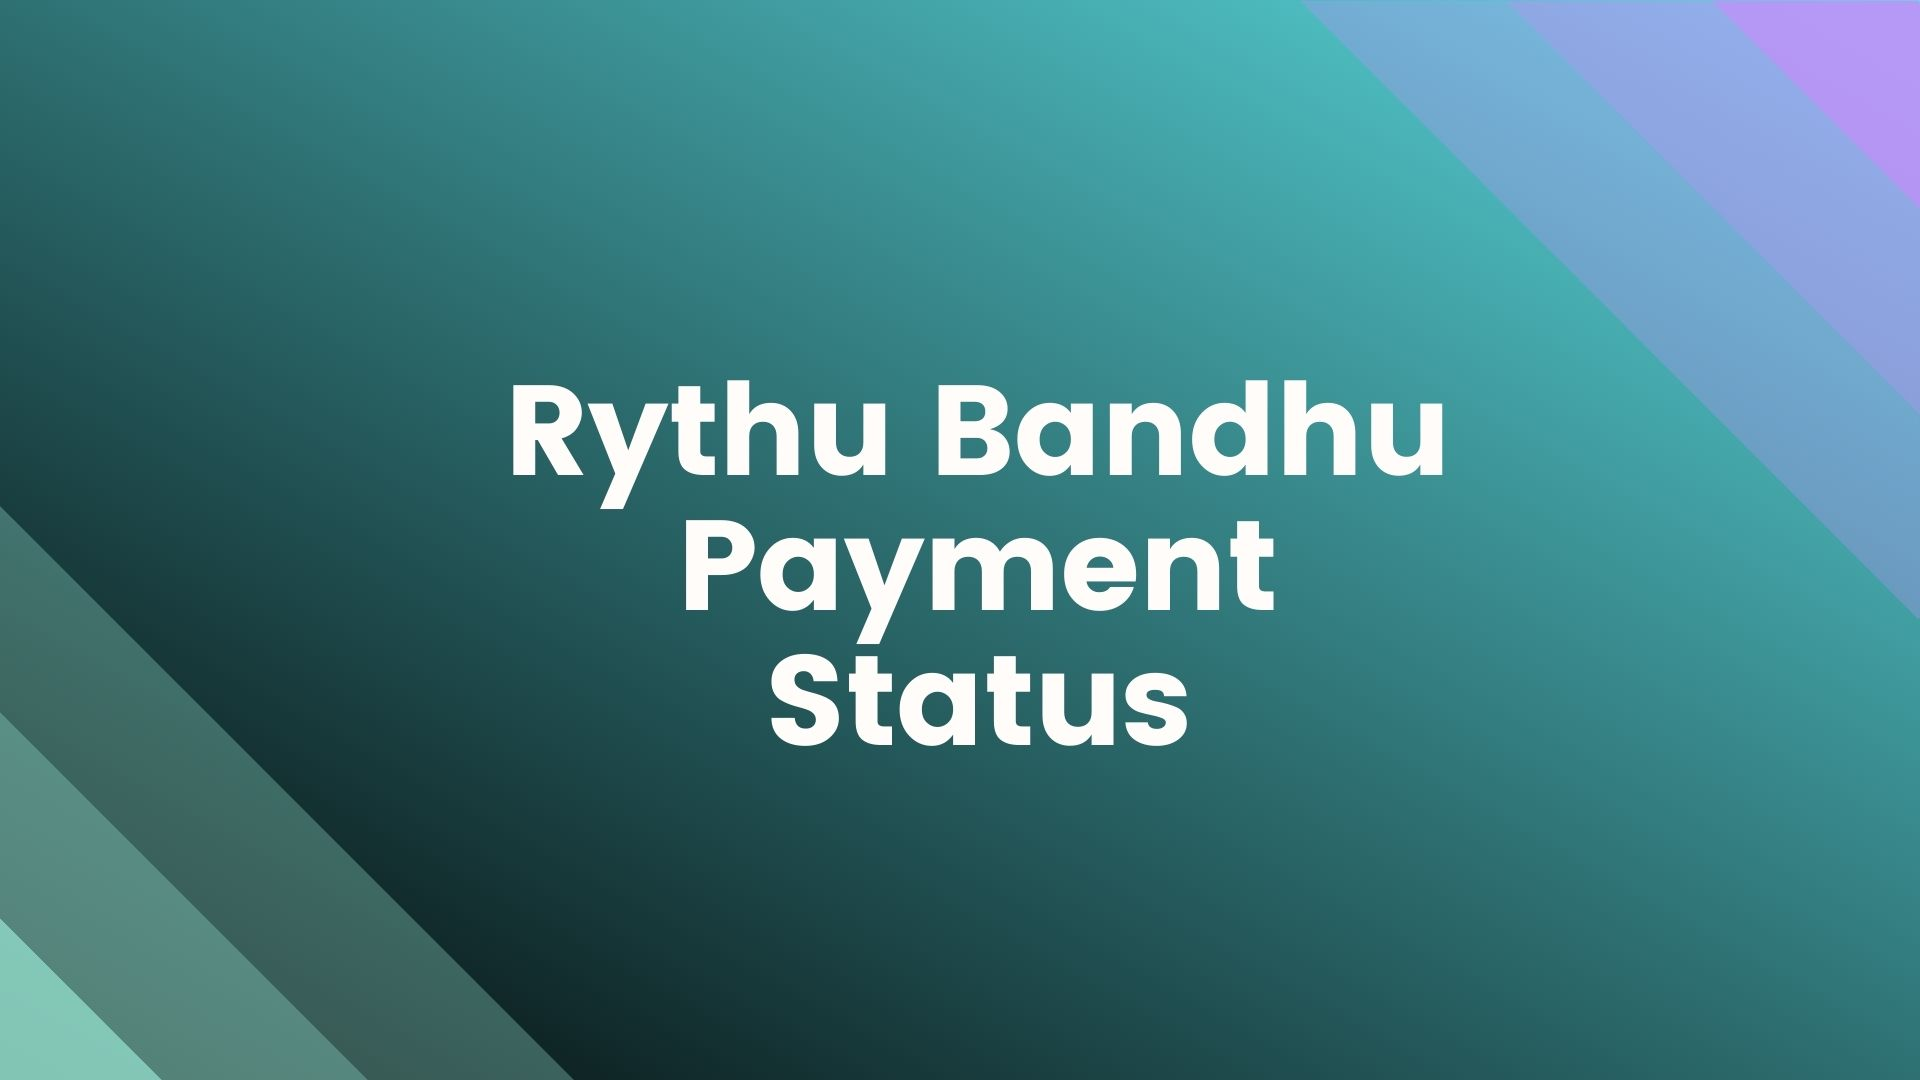 Rythu-Bandhu-Payment-Status